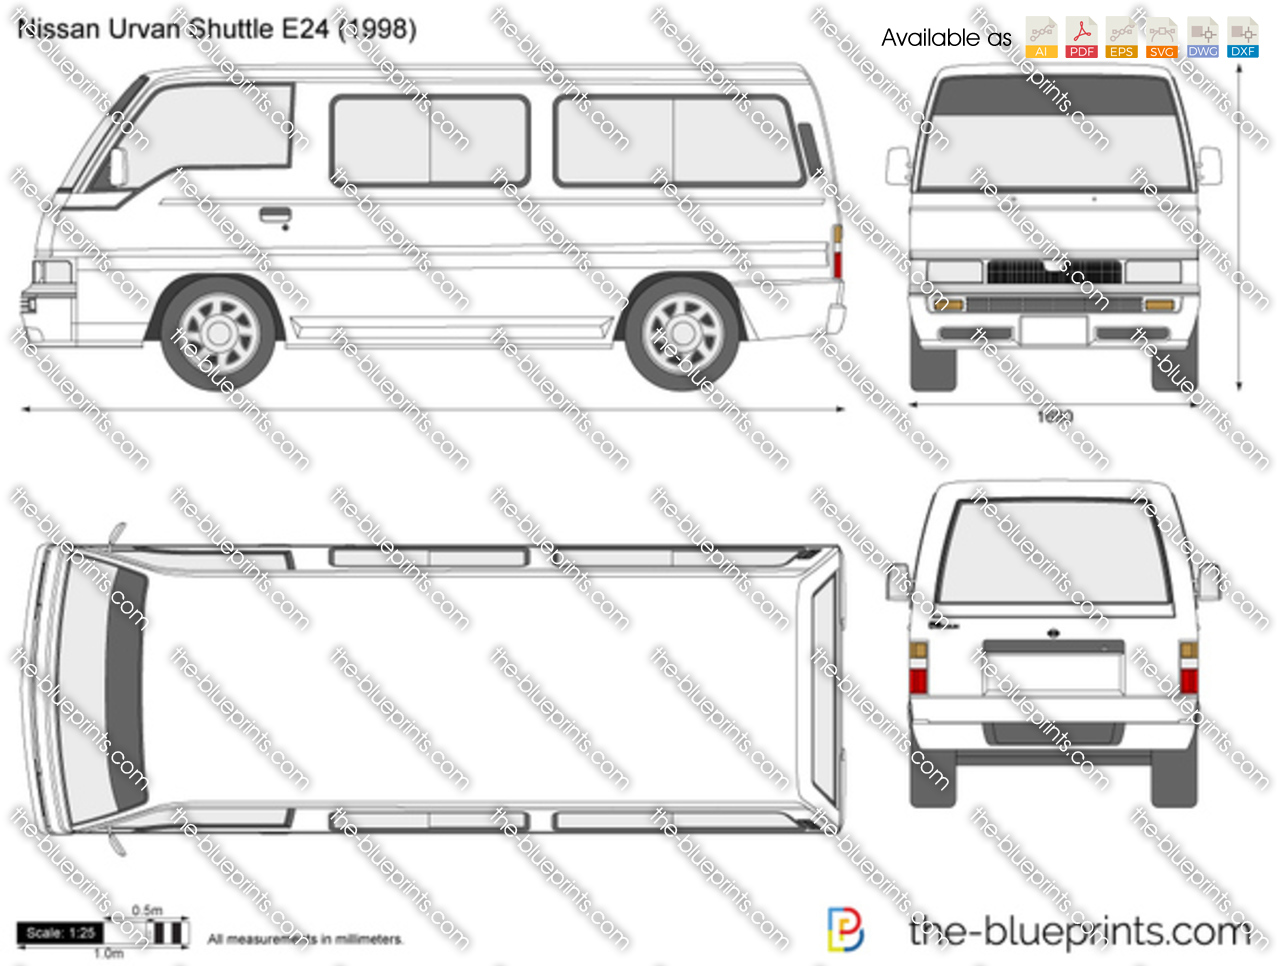 Nissan Urvan Shuttle E24